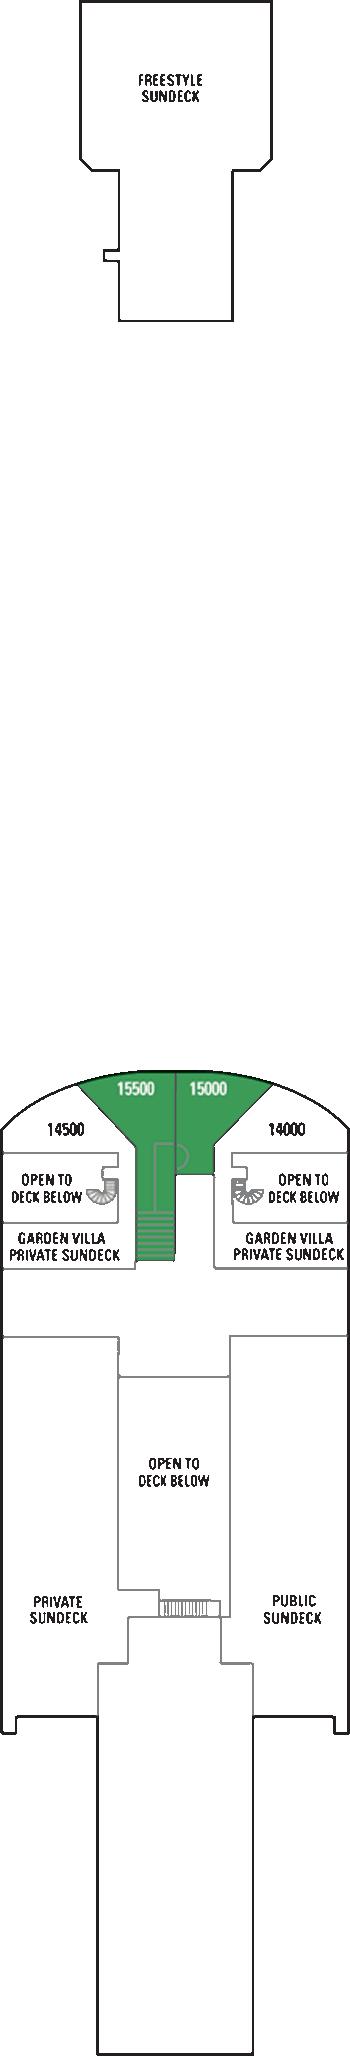 Norwegian Gem - Deck 15